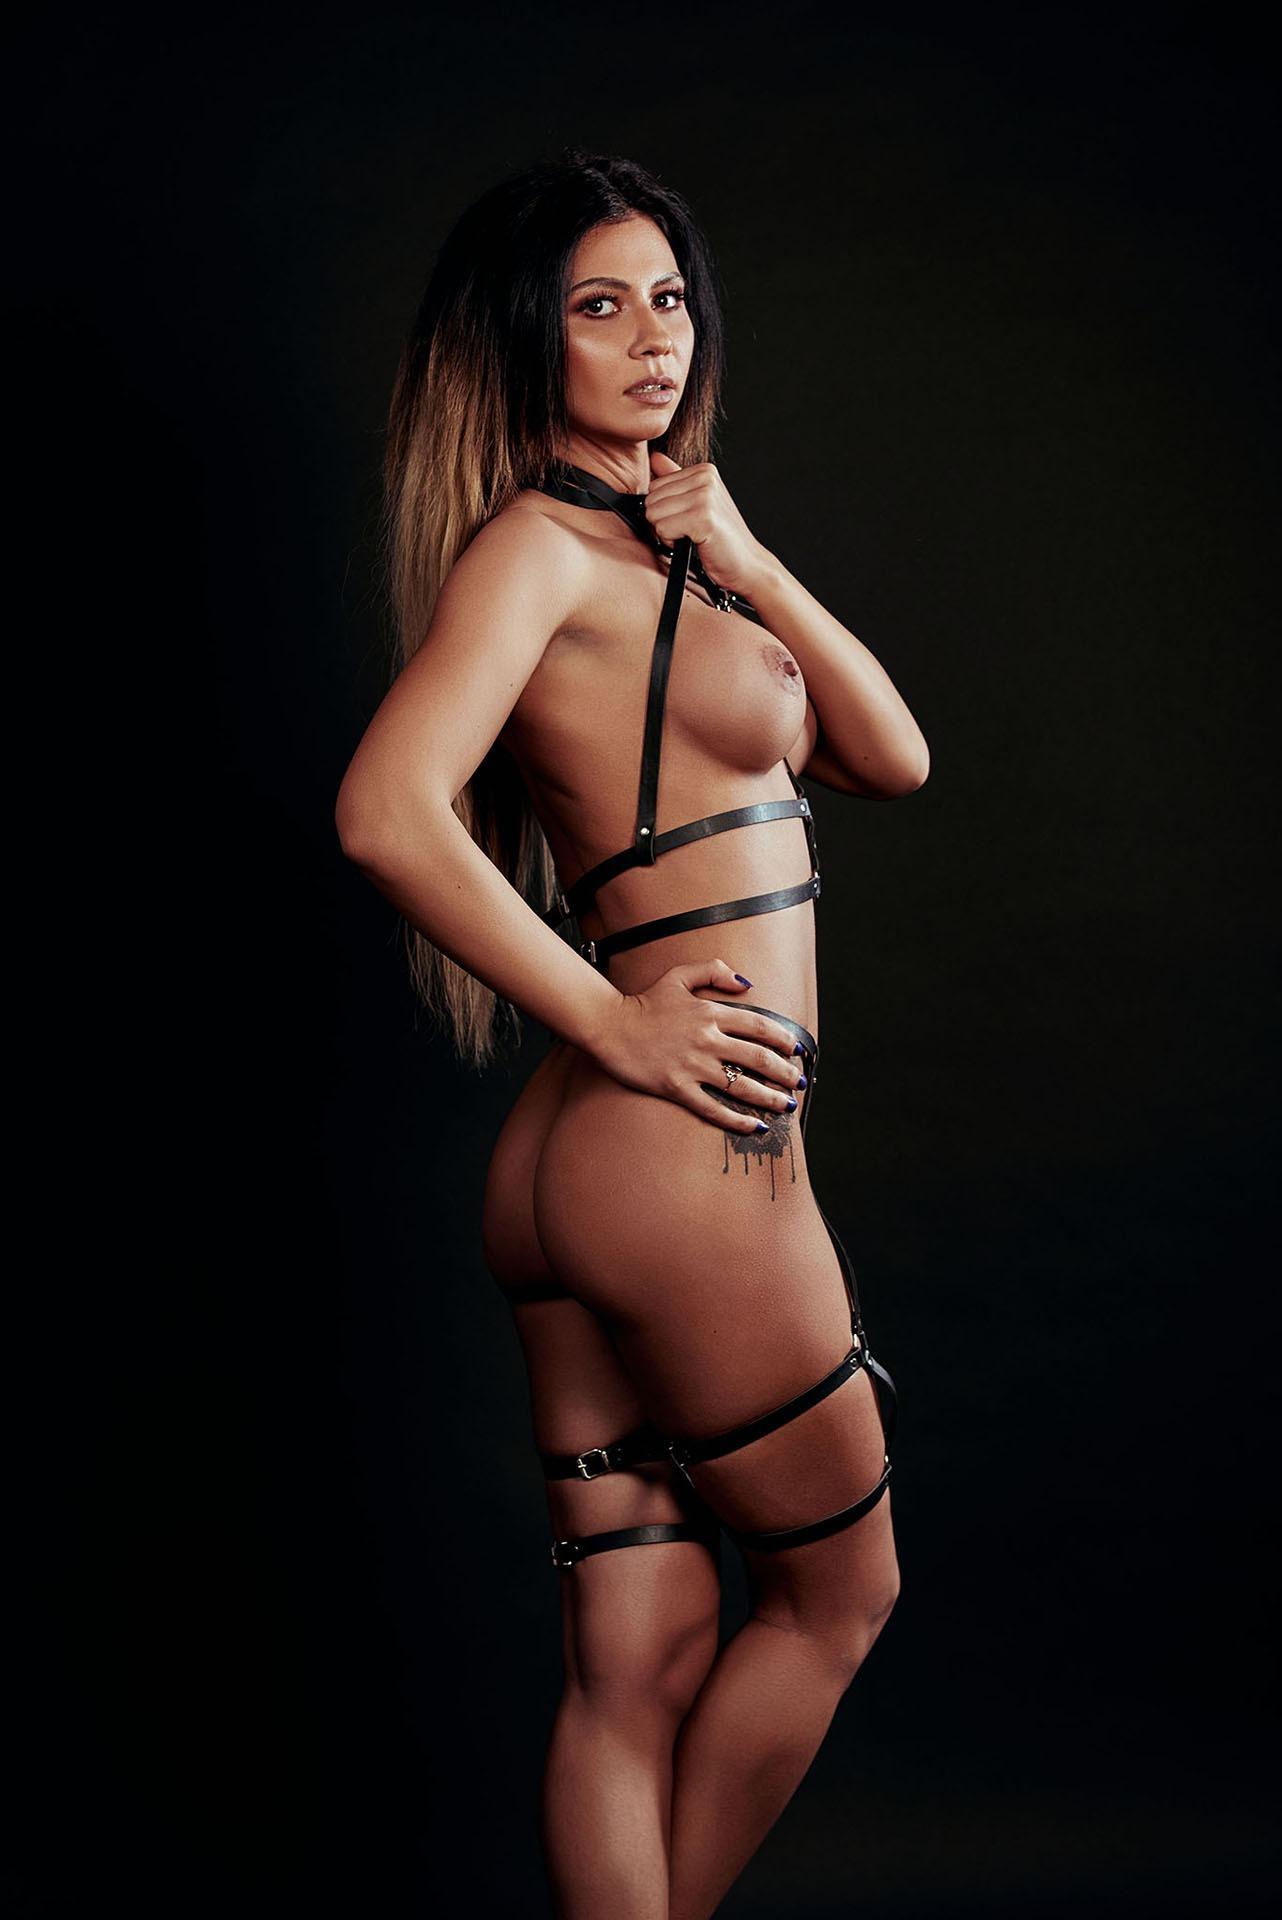 sedinta foto boudoir, boudoir, shooting, sedinta foto, model, erotic, sexy, sensual, booty, lingerie, lenjerie, fotograf profesionist, fetish, retouch, dark, fotograf nud, fotograf profesionist nud, sedinta foto sexy